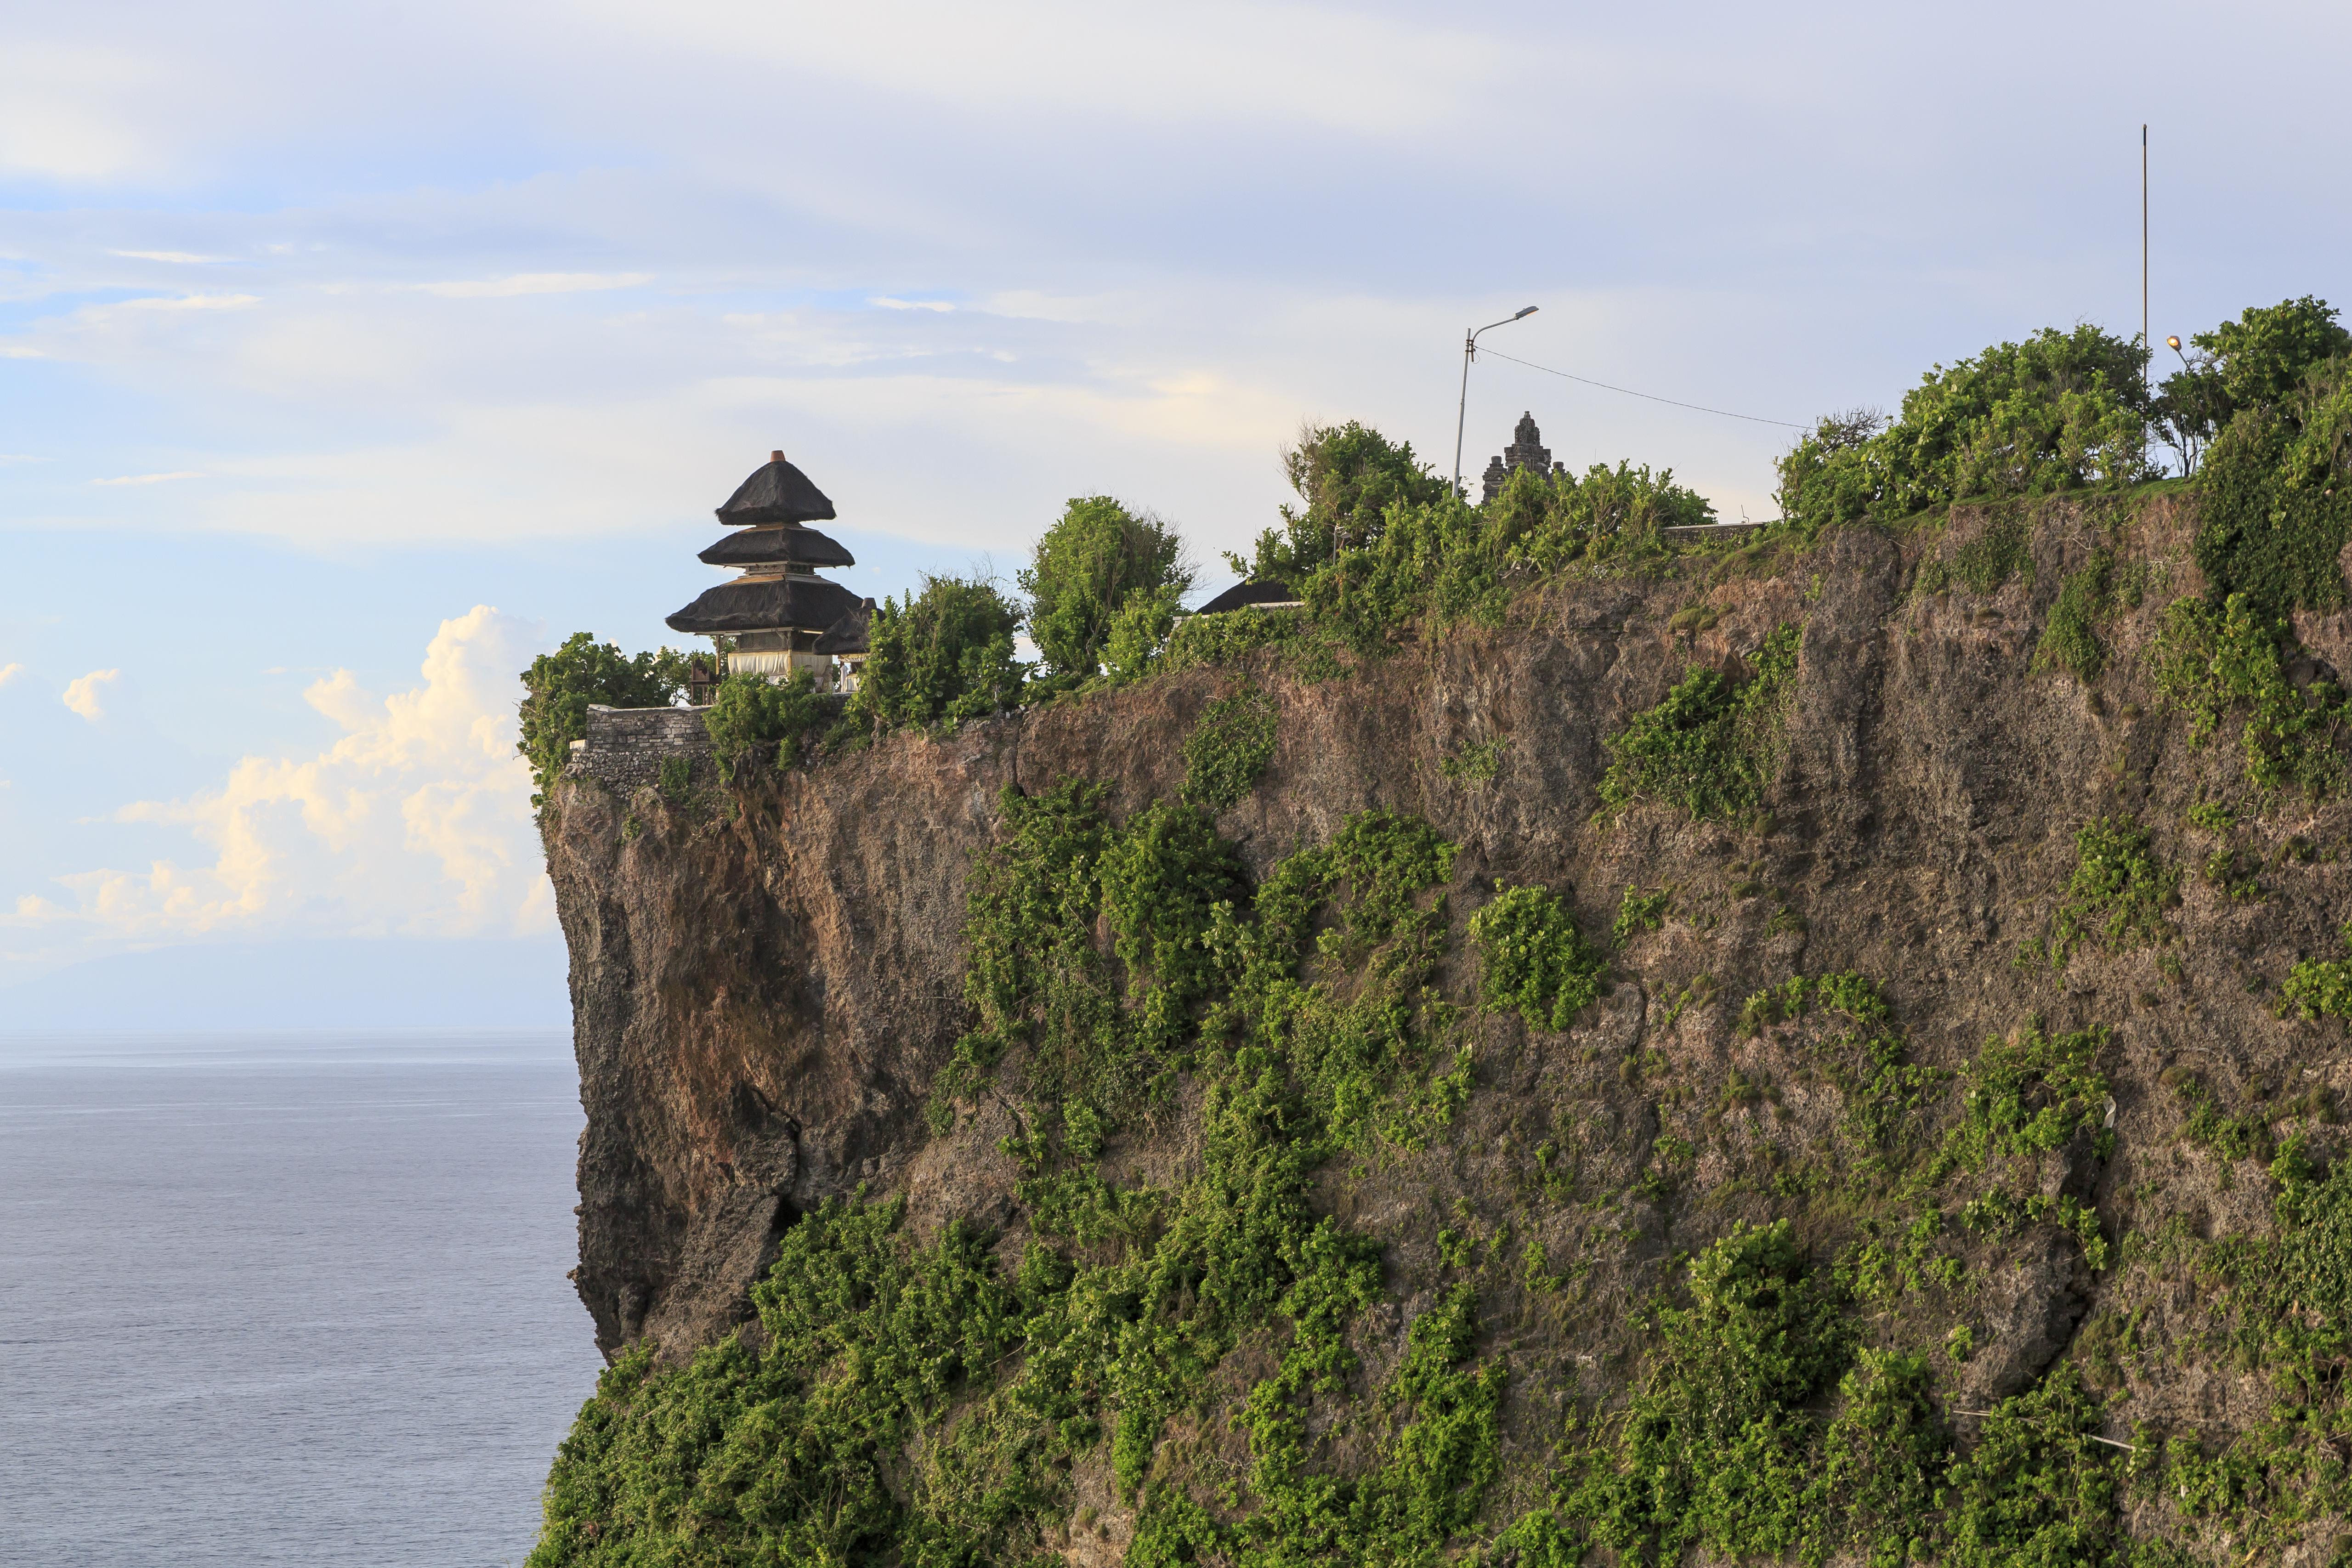 File Kuta Bali Indonesia Pura Luhur Uluwatu 03 Jpg Wikimedia